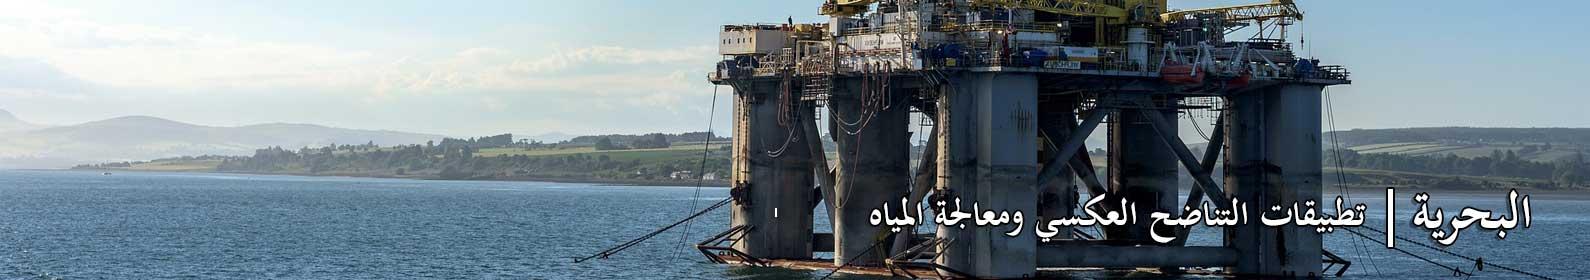 -offshore-industry.jpg